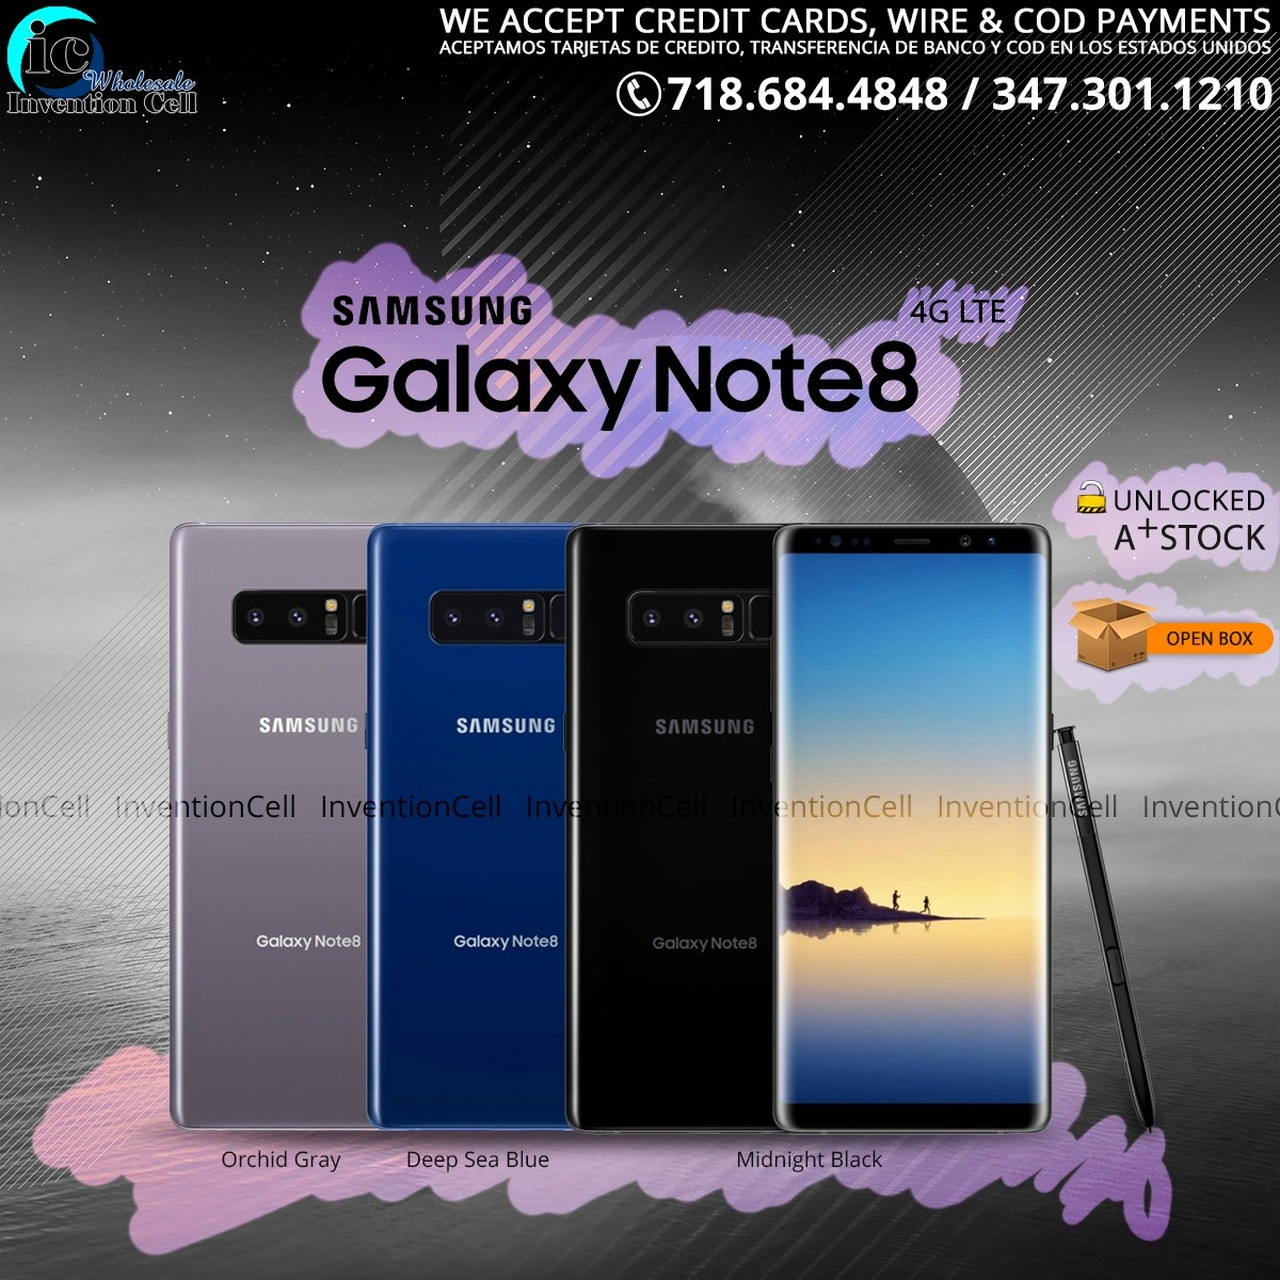 Samsung Galaxy Note 8 4G LTE 64GB (T-Mobile) Unlocked, (Open Box) A+ Stock  (Black)